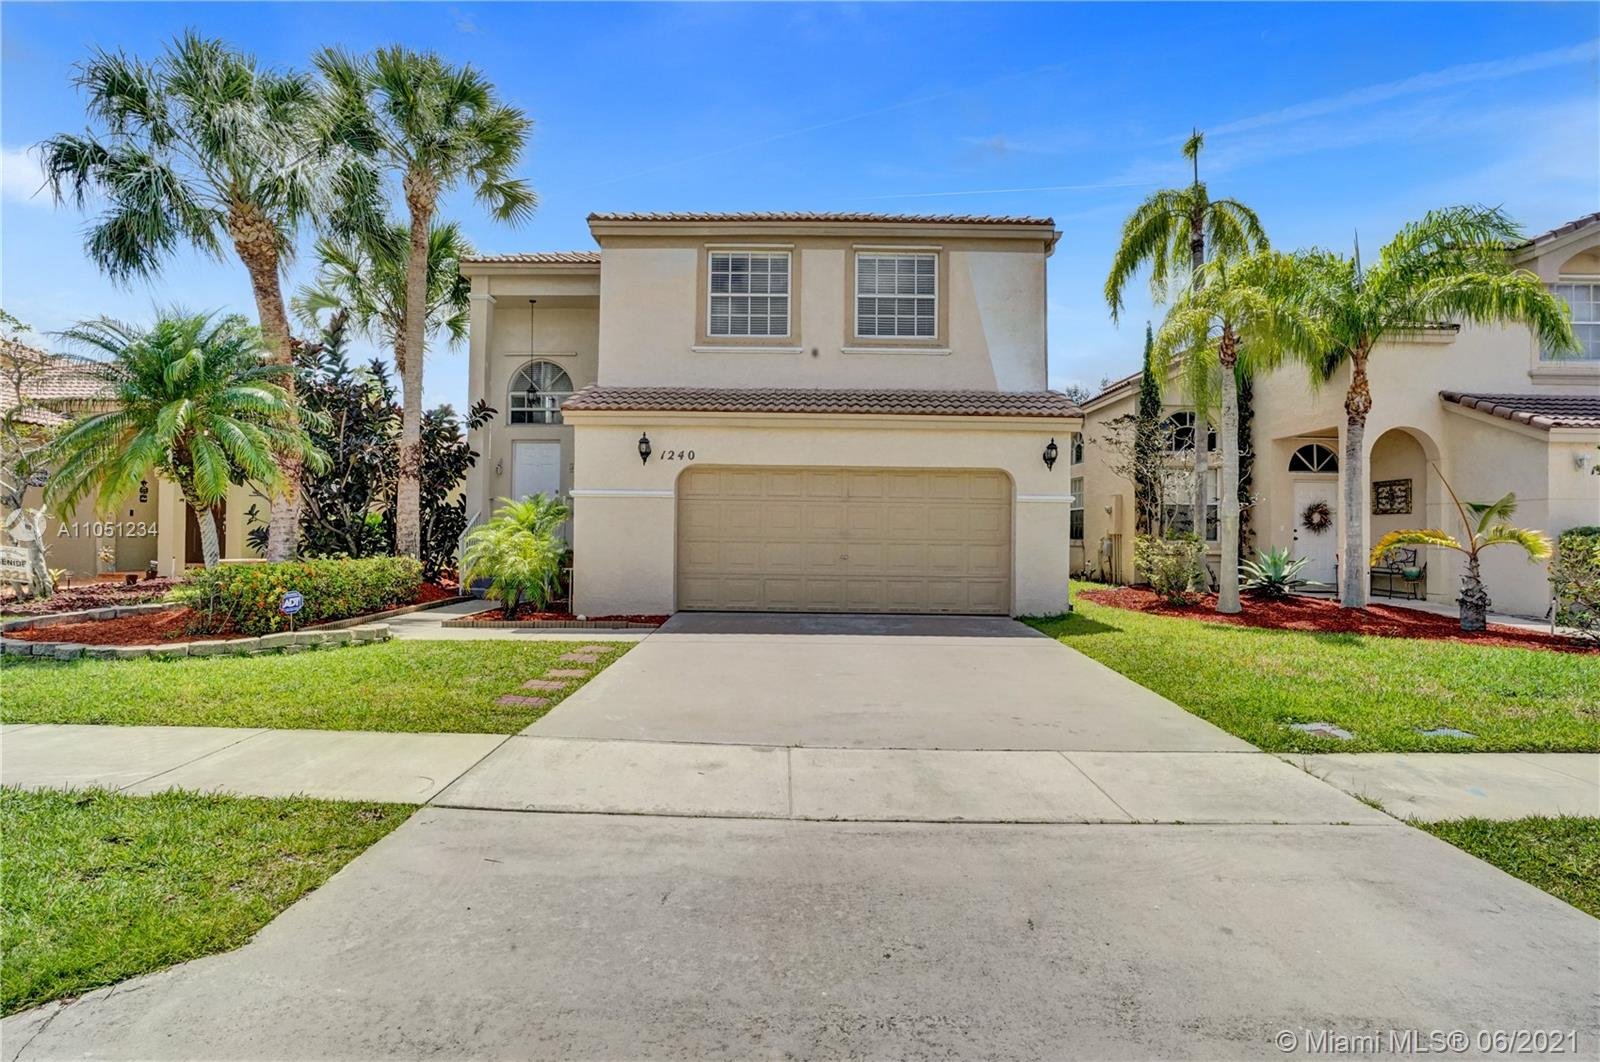 Towngate - 1240 NW 159th Ave, Pembroke Pines, FL 33028